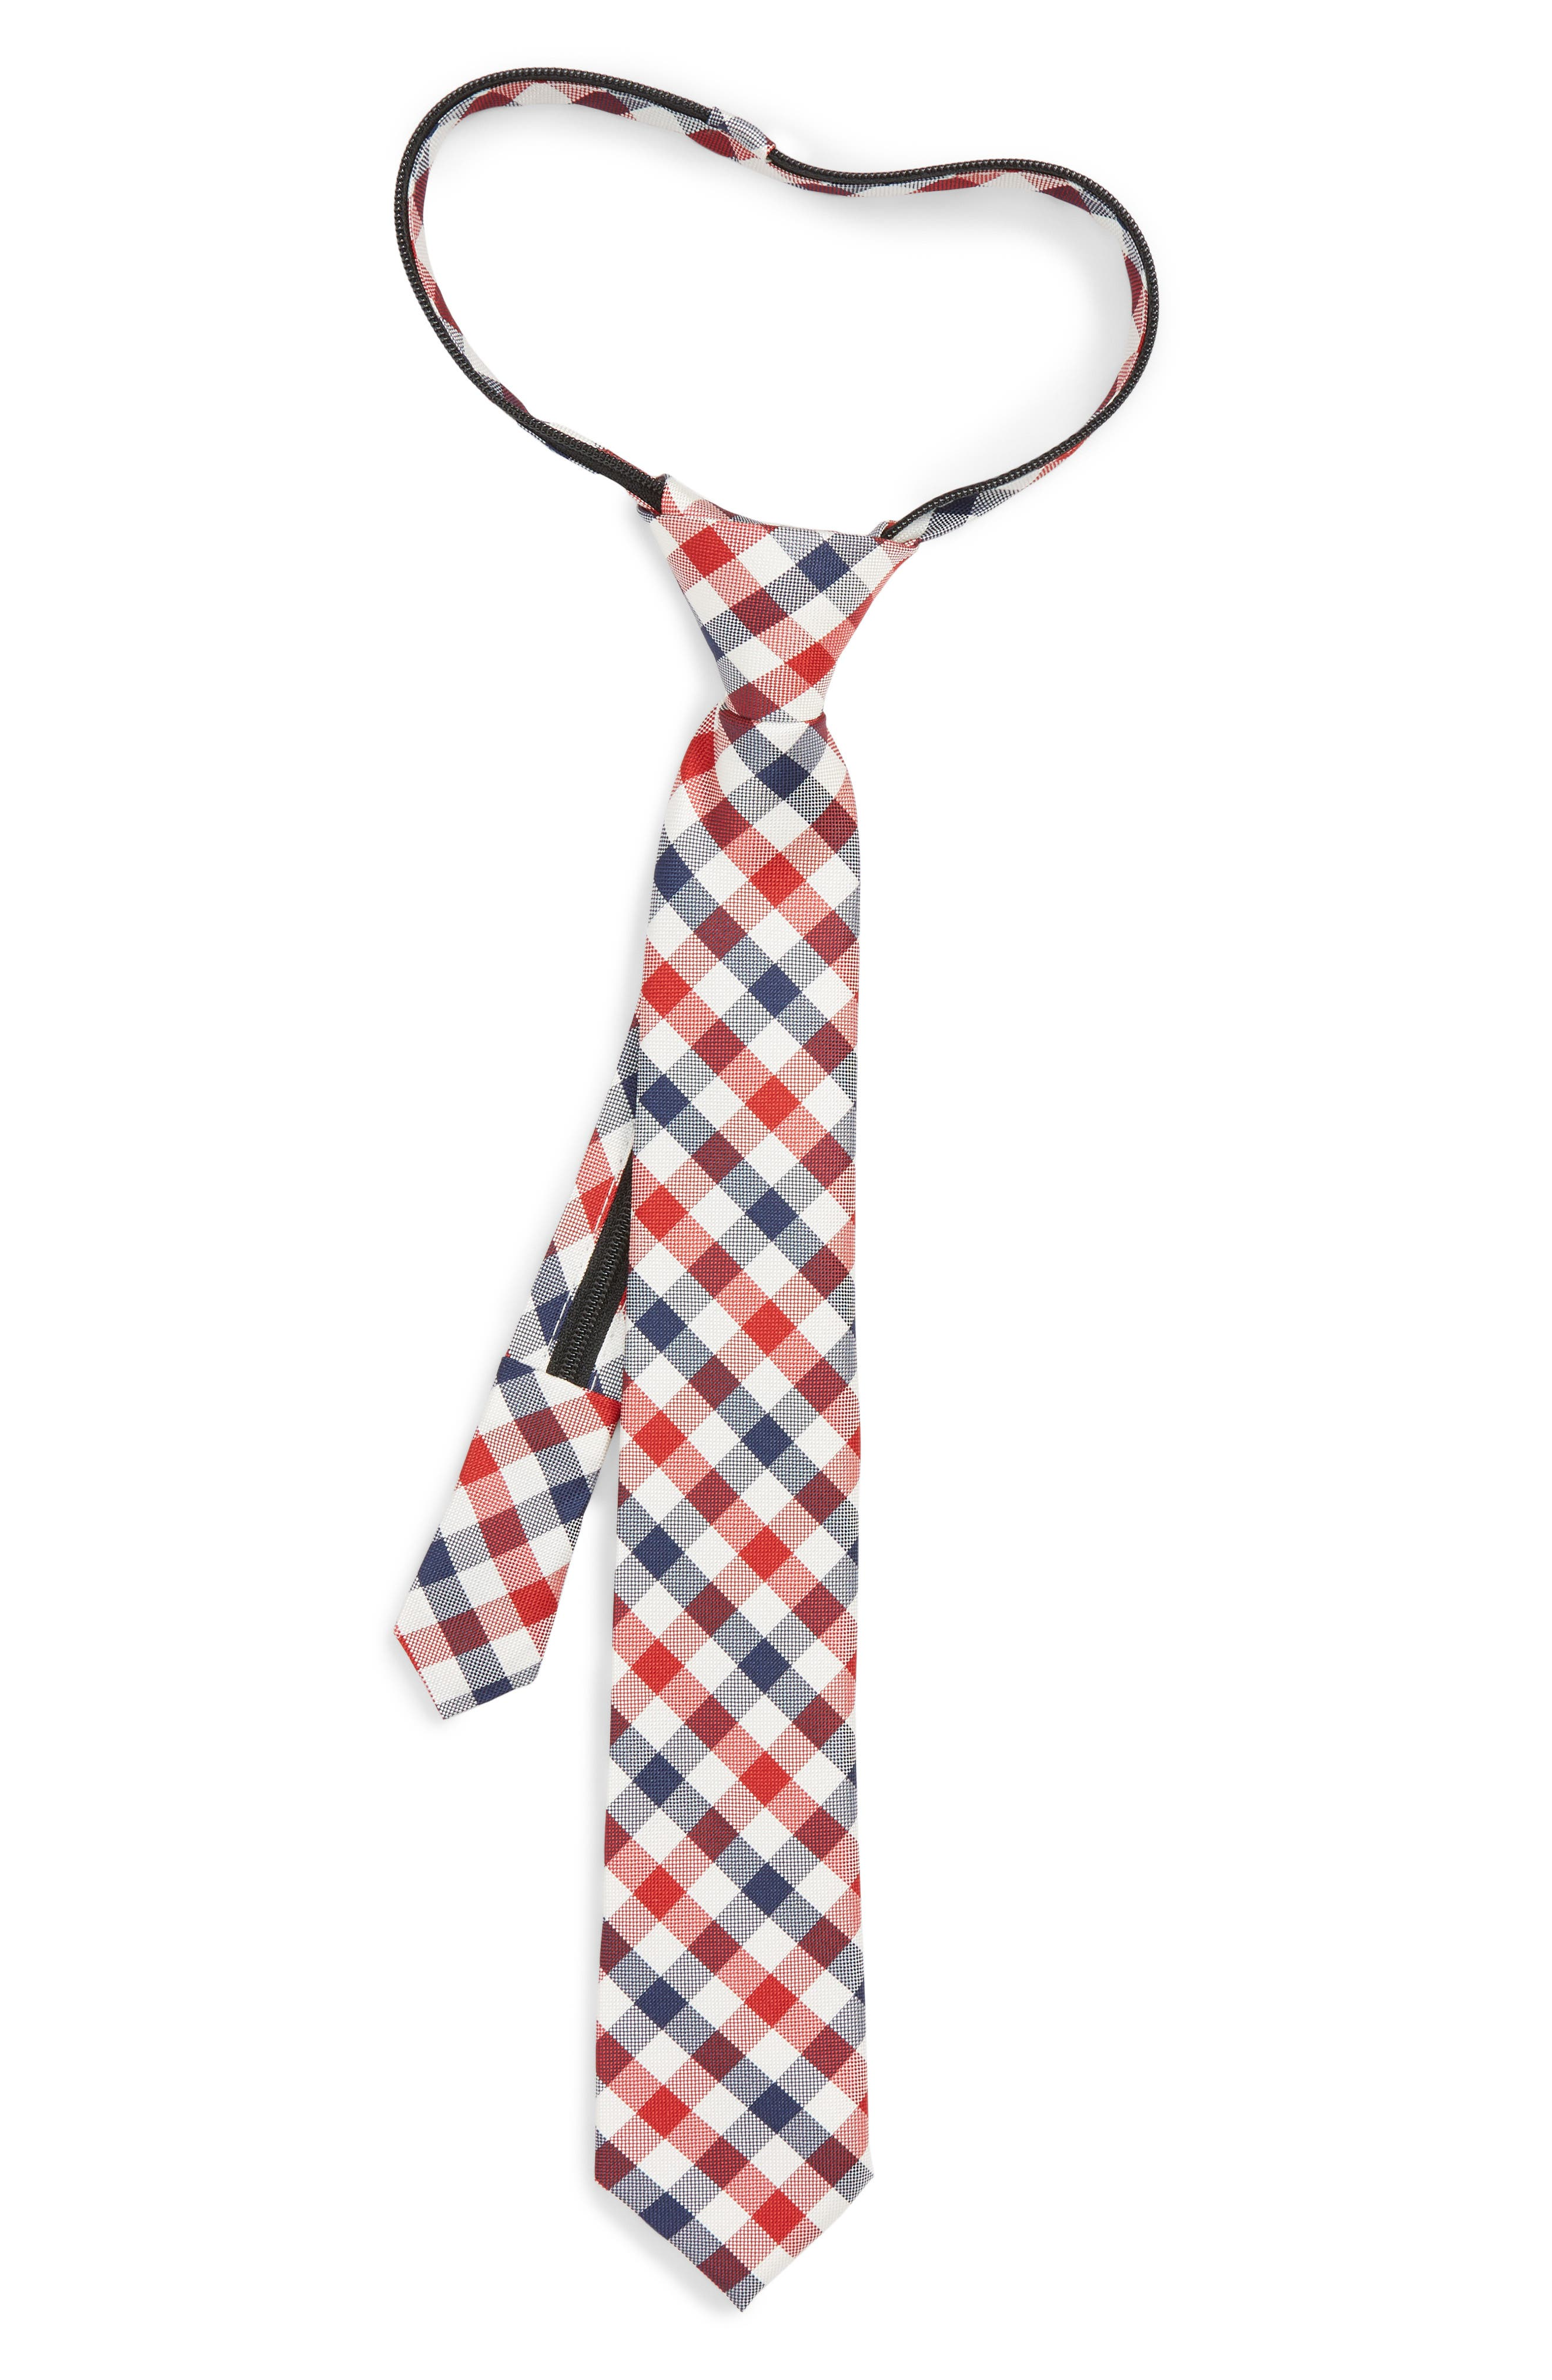 Natte Weave Silk Zip Tie,                             Main thumbnail 1, color,                             411